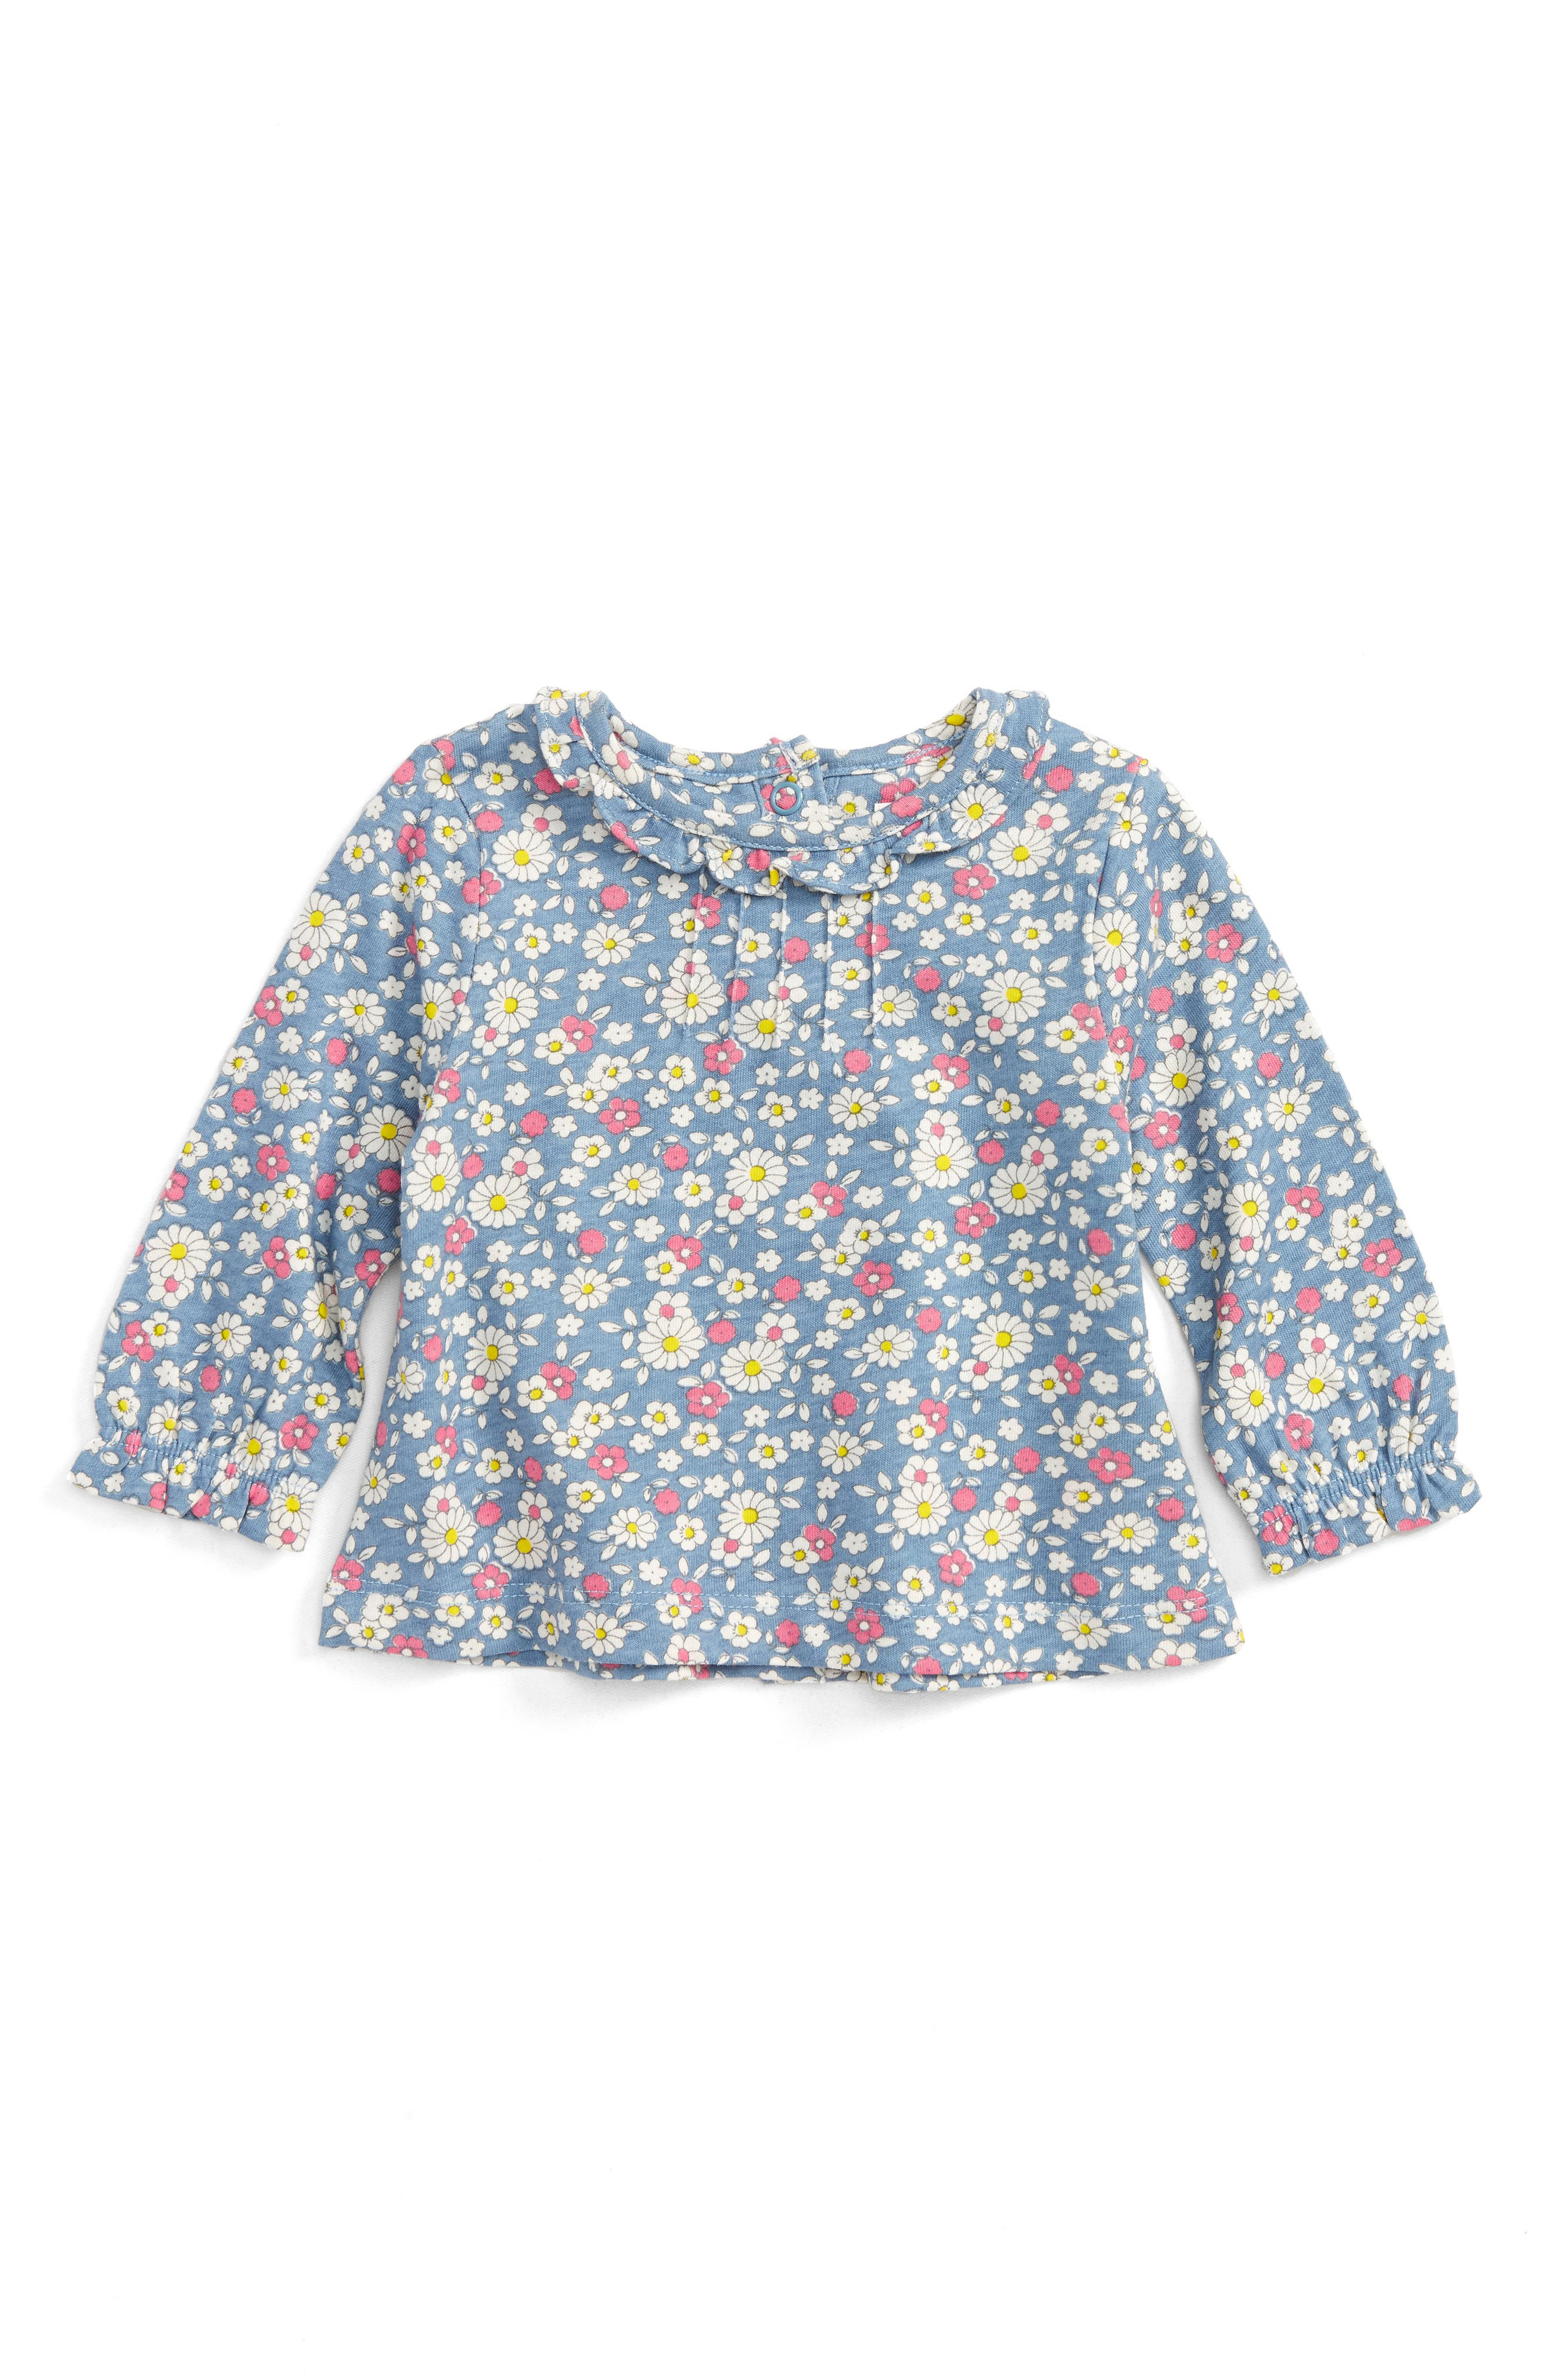 Main Image - Mini Boden Pretty Printed Shirt (Baby Girls & Toddler Girls)